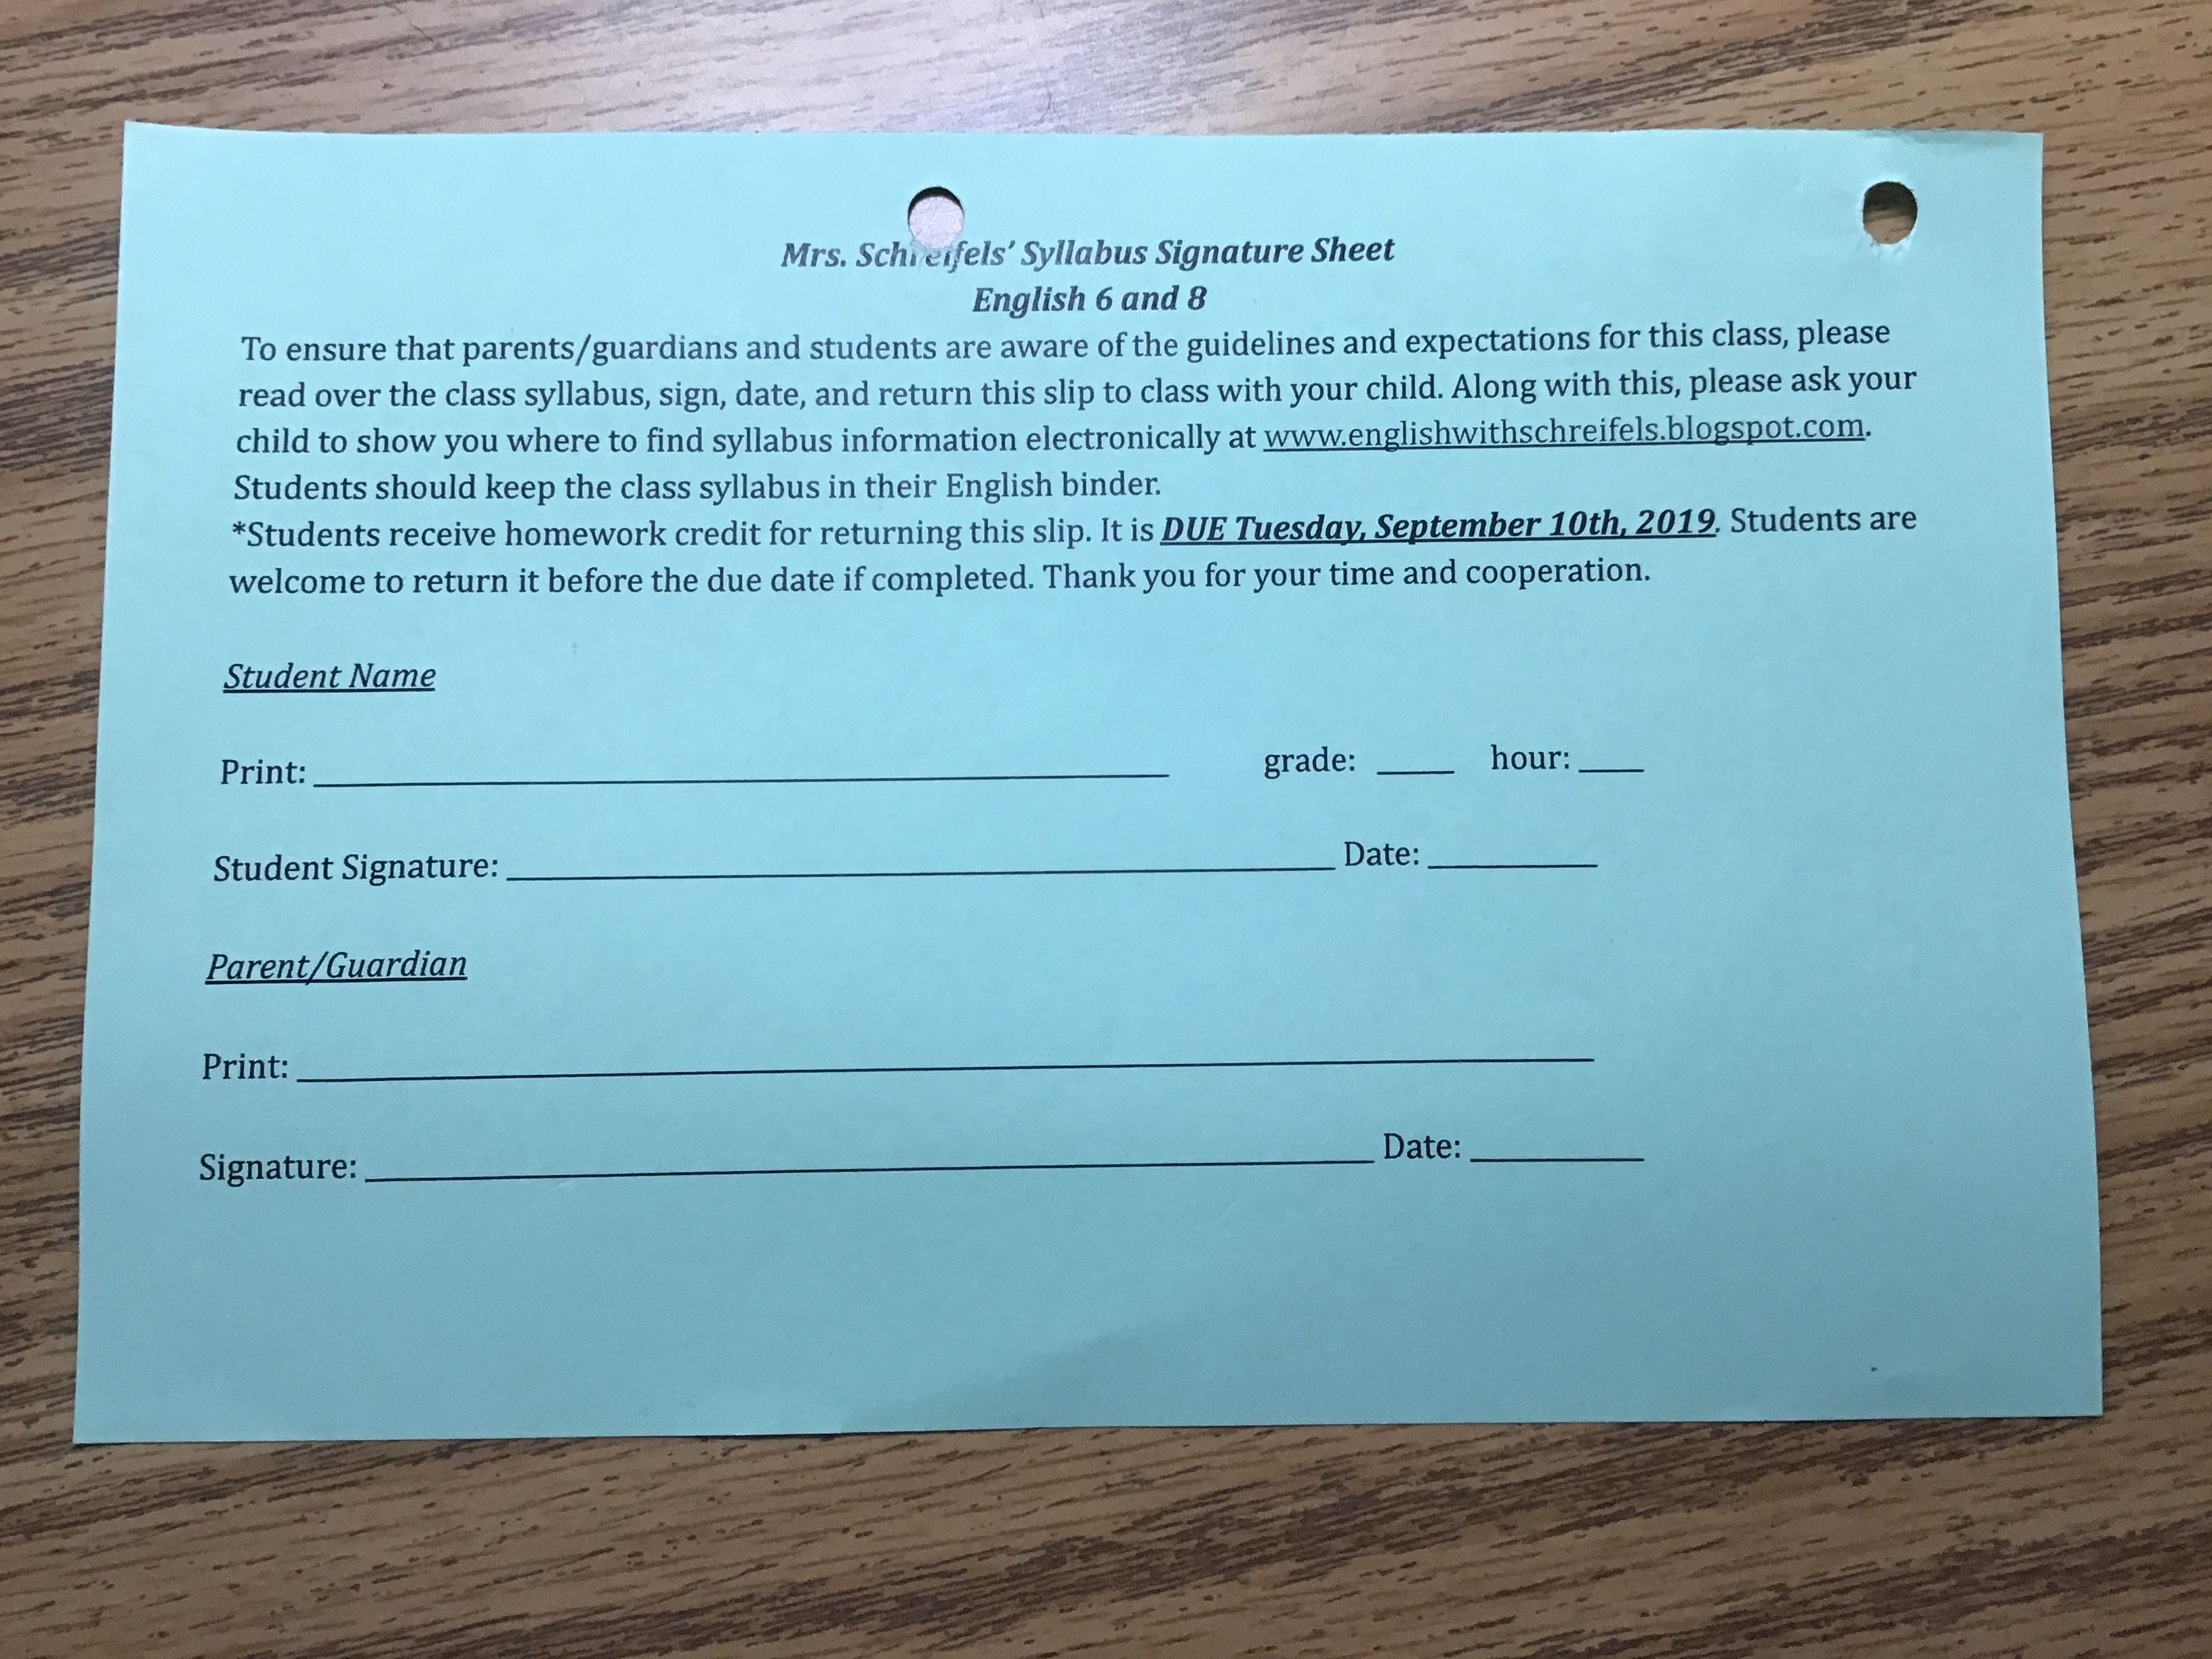 Syllabus Signature Sheet 9 10 19 In